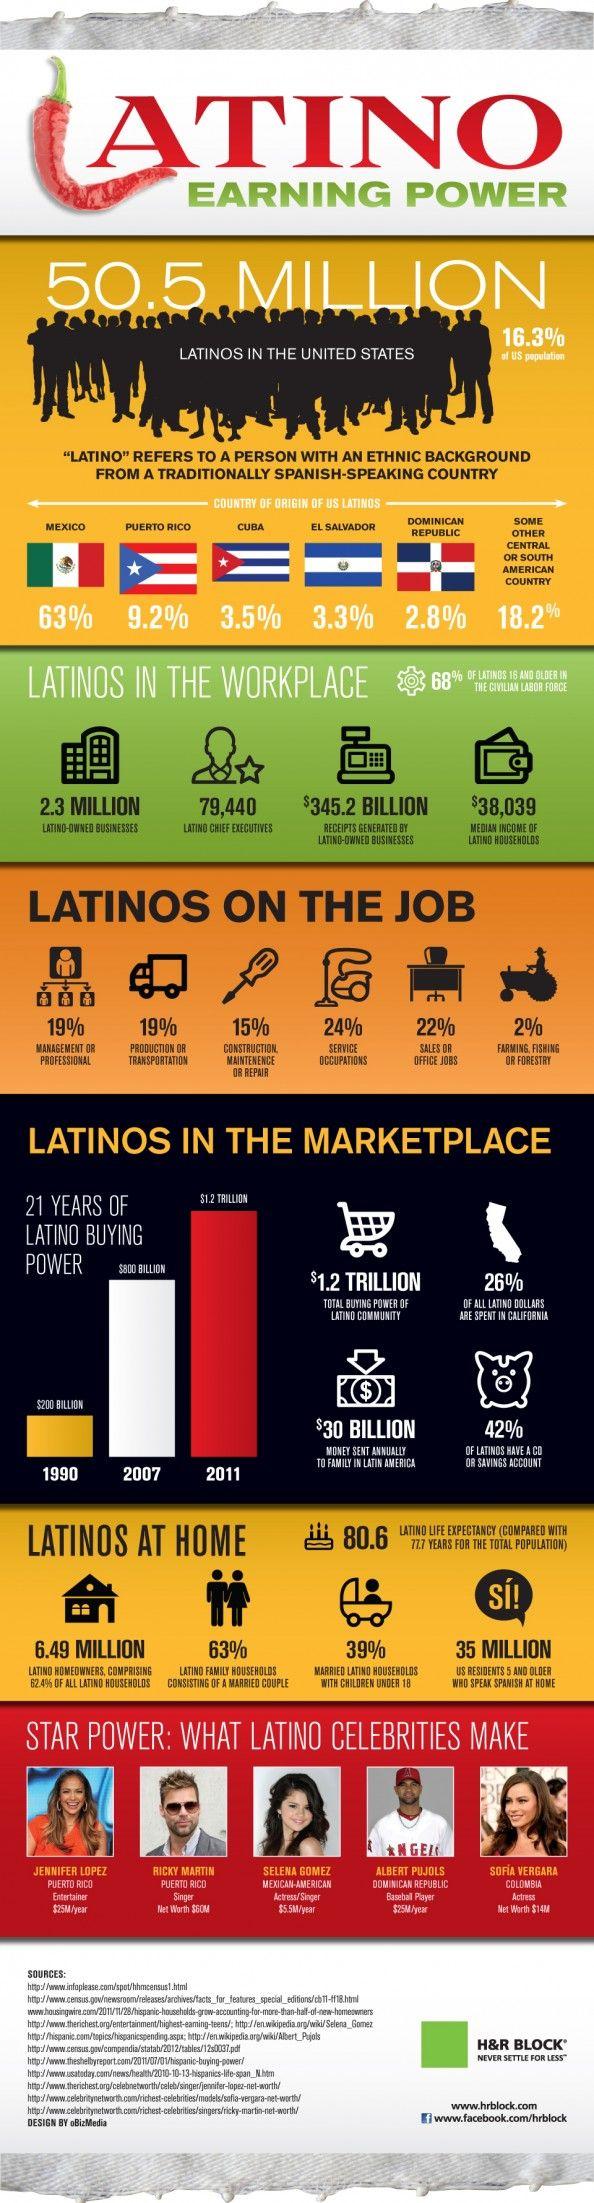 Sept 15 National Hispanic Heritage Month